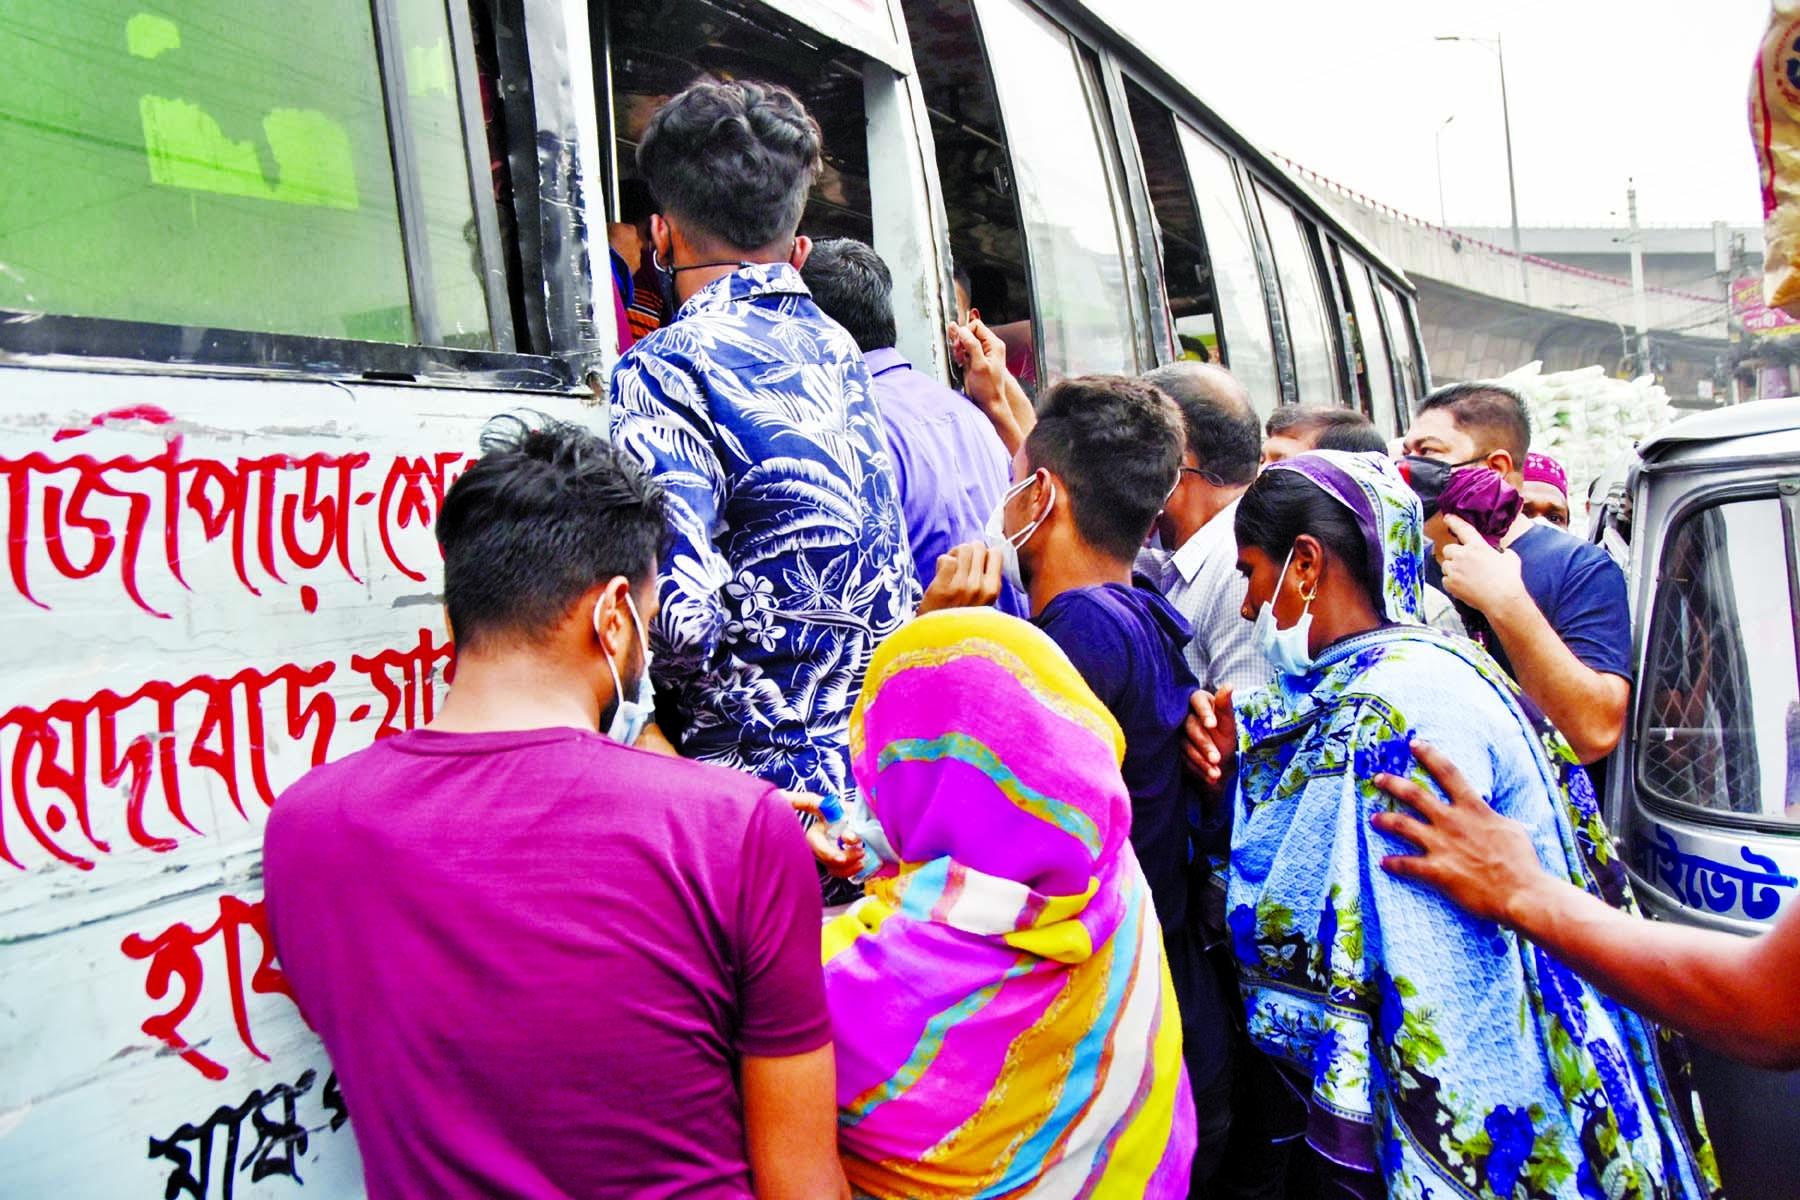 Dhaka roads hum with traffic